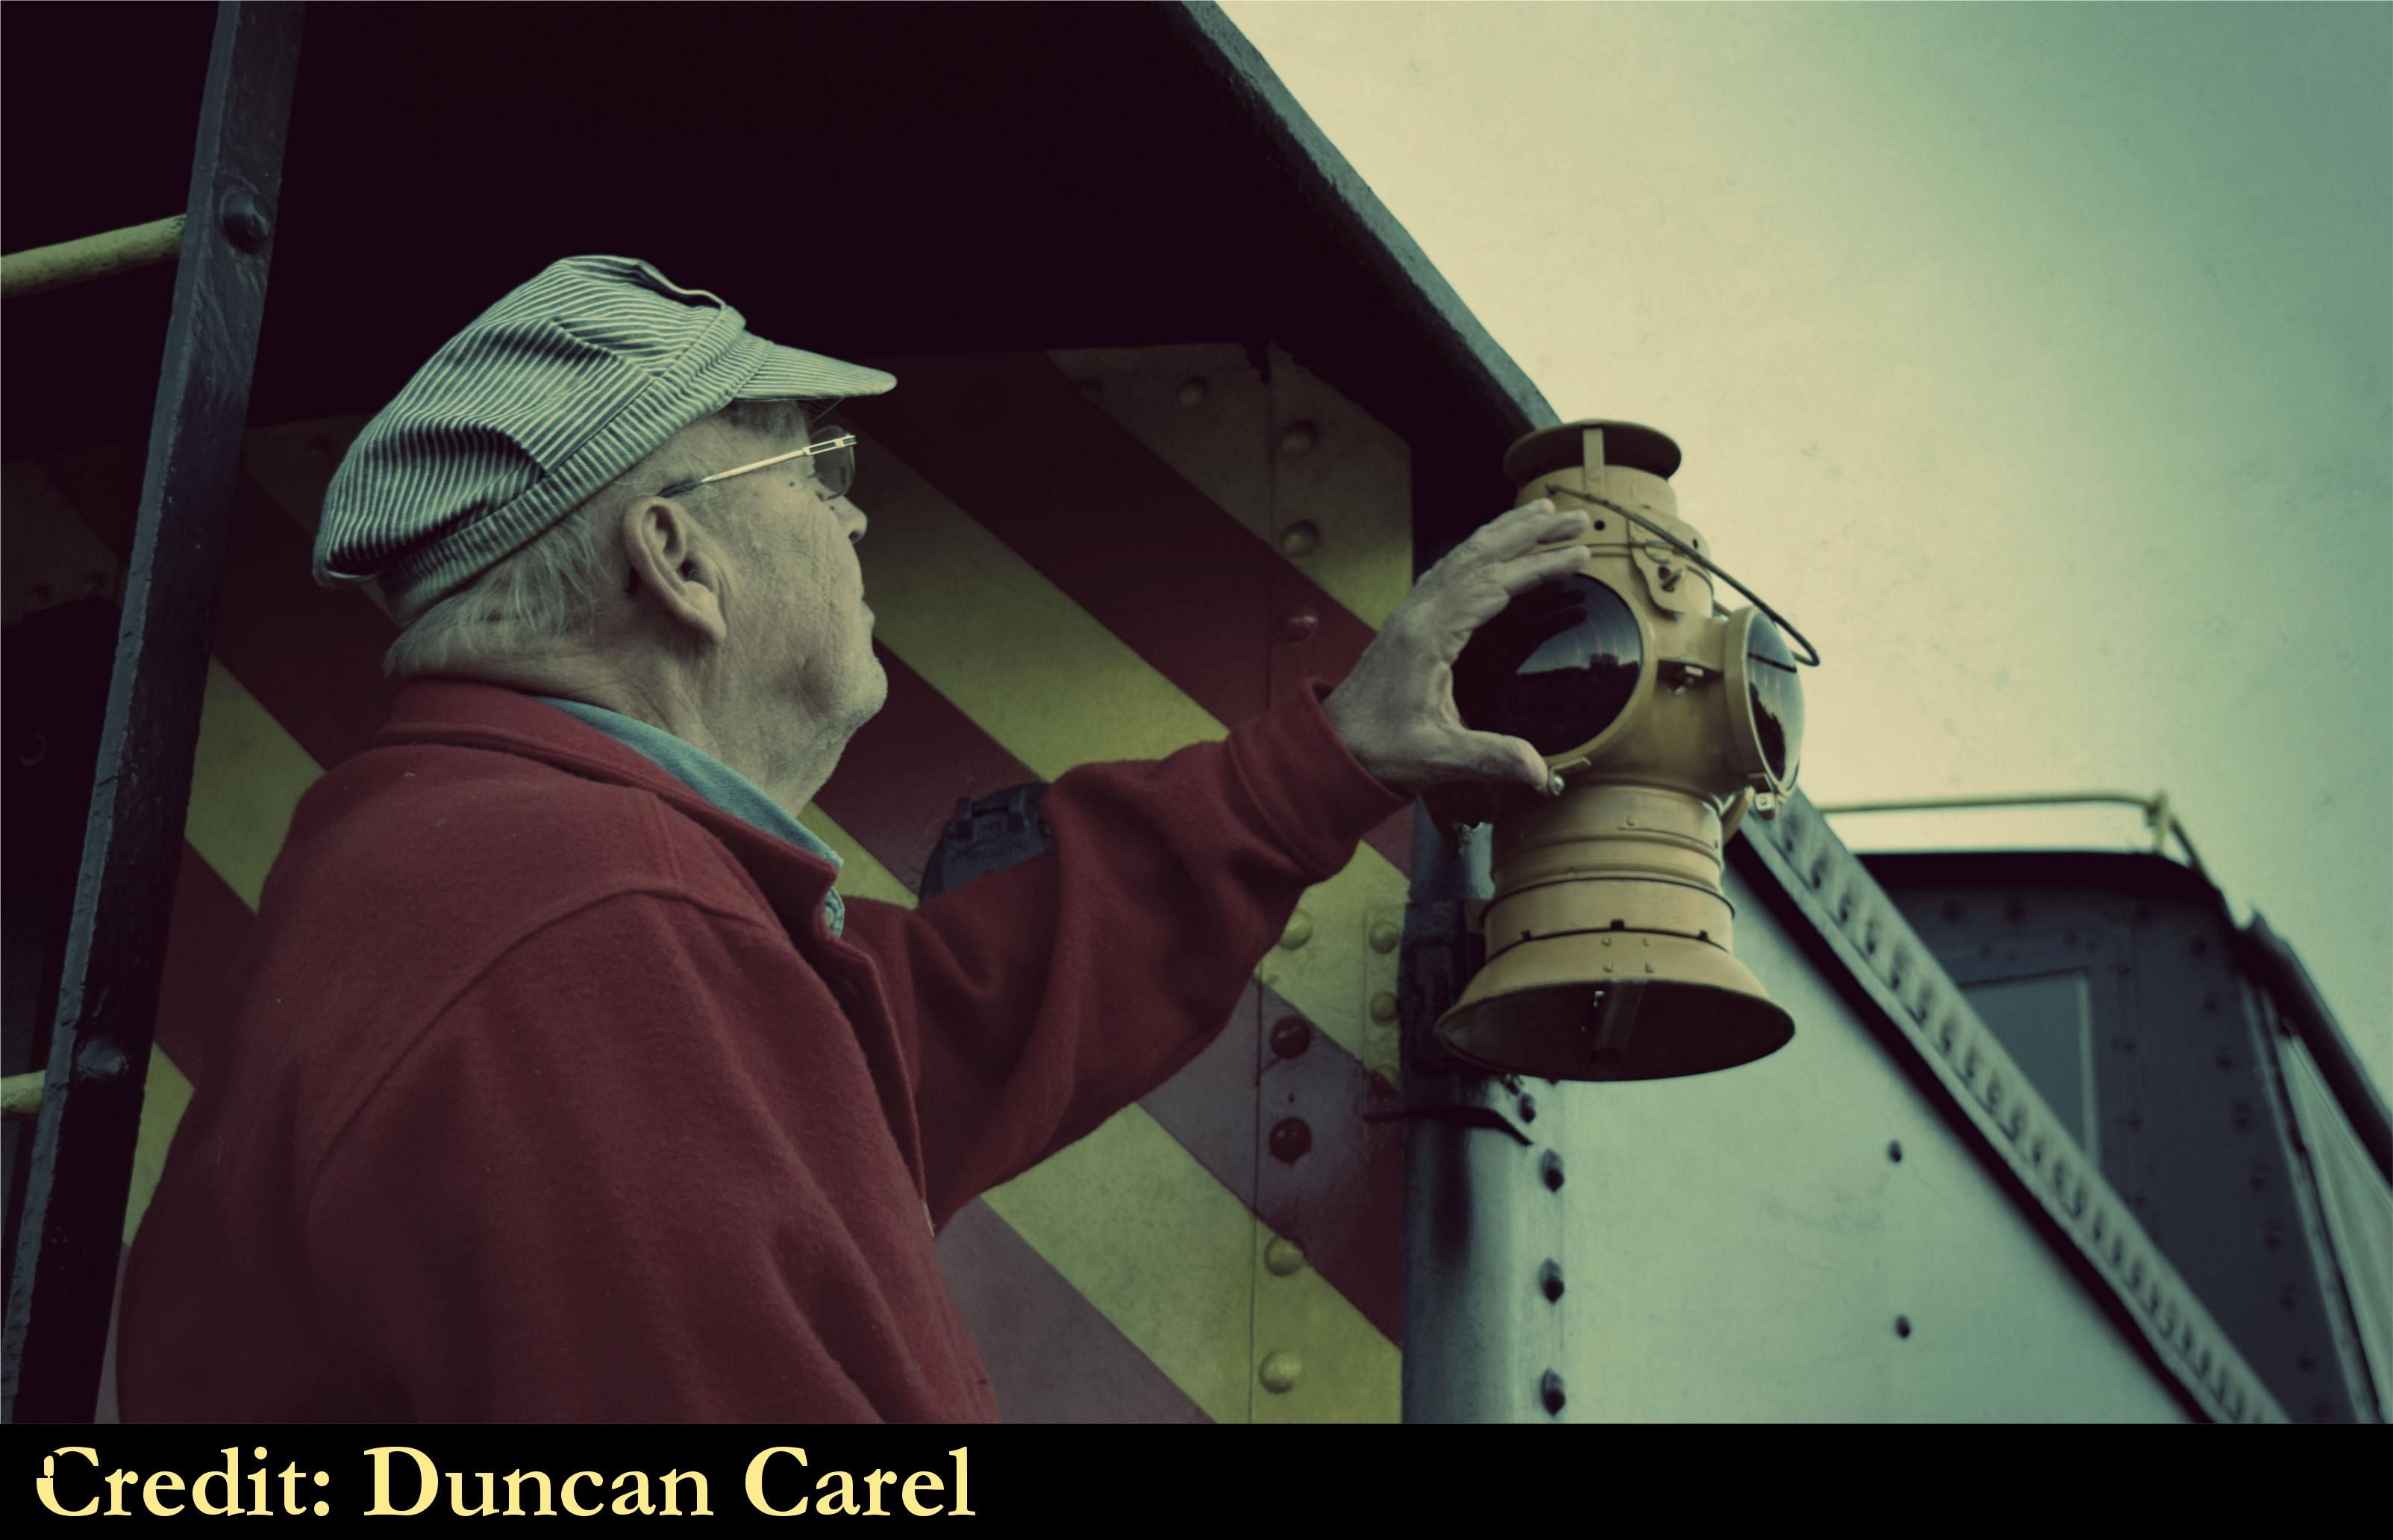 DuncanCarel1